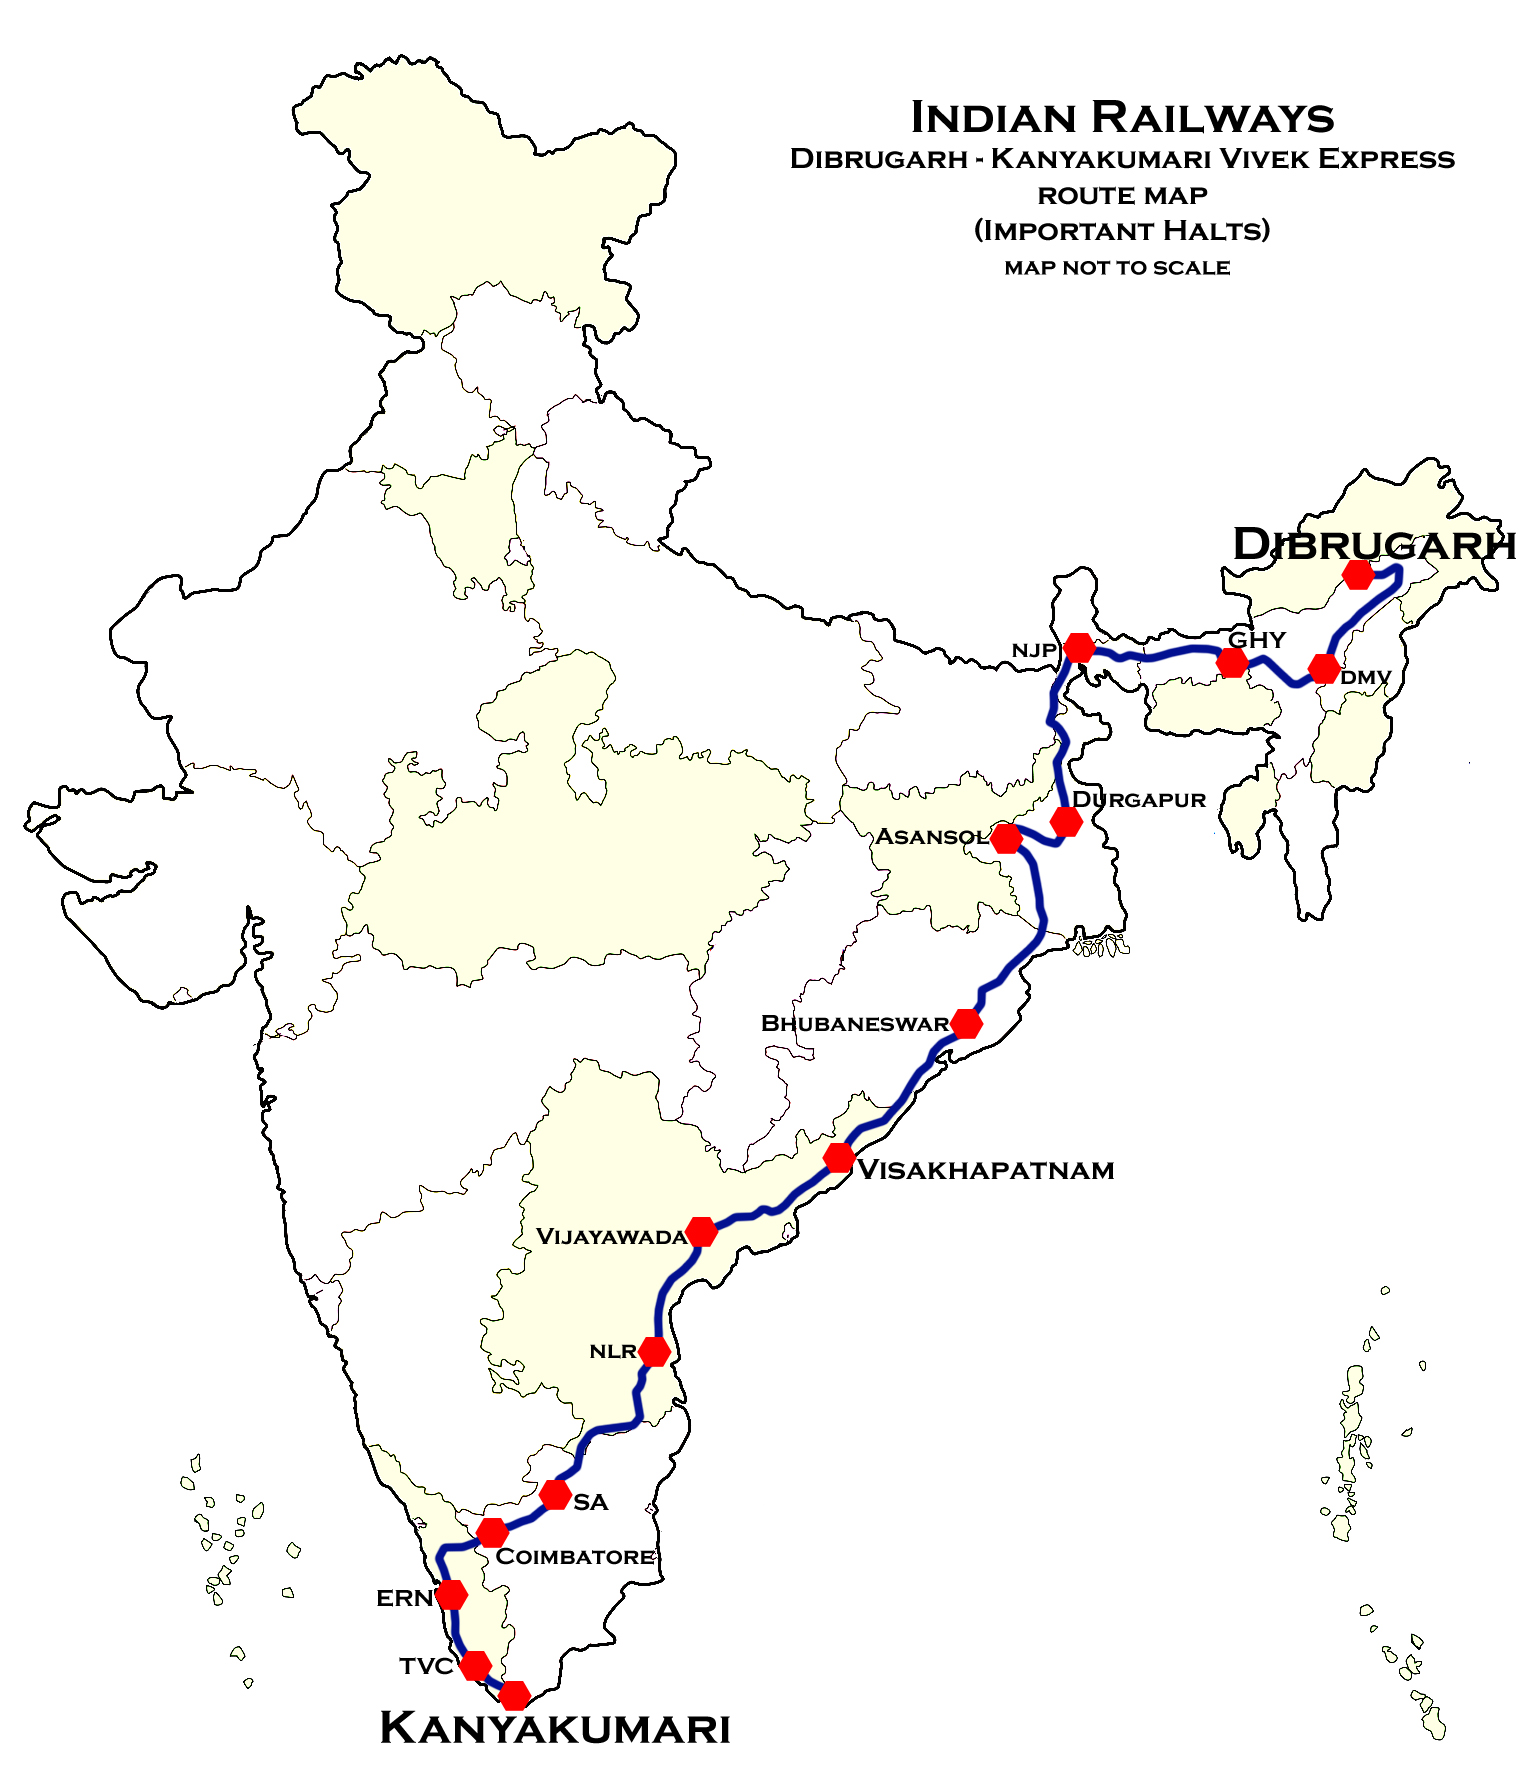 Ruta del Dibrugarh - Kanyakumari Vivek Express